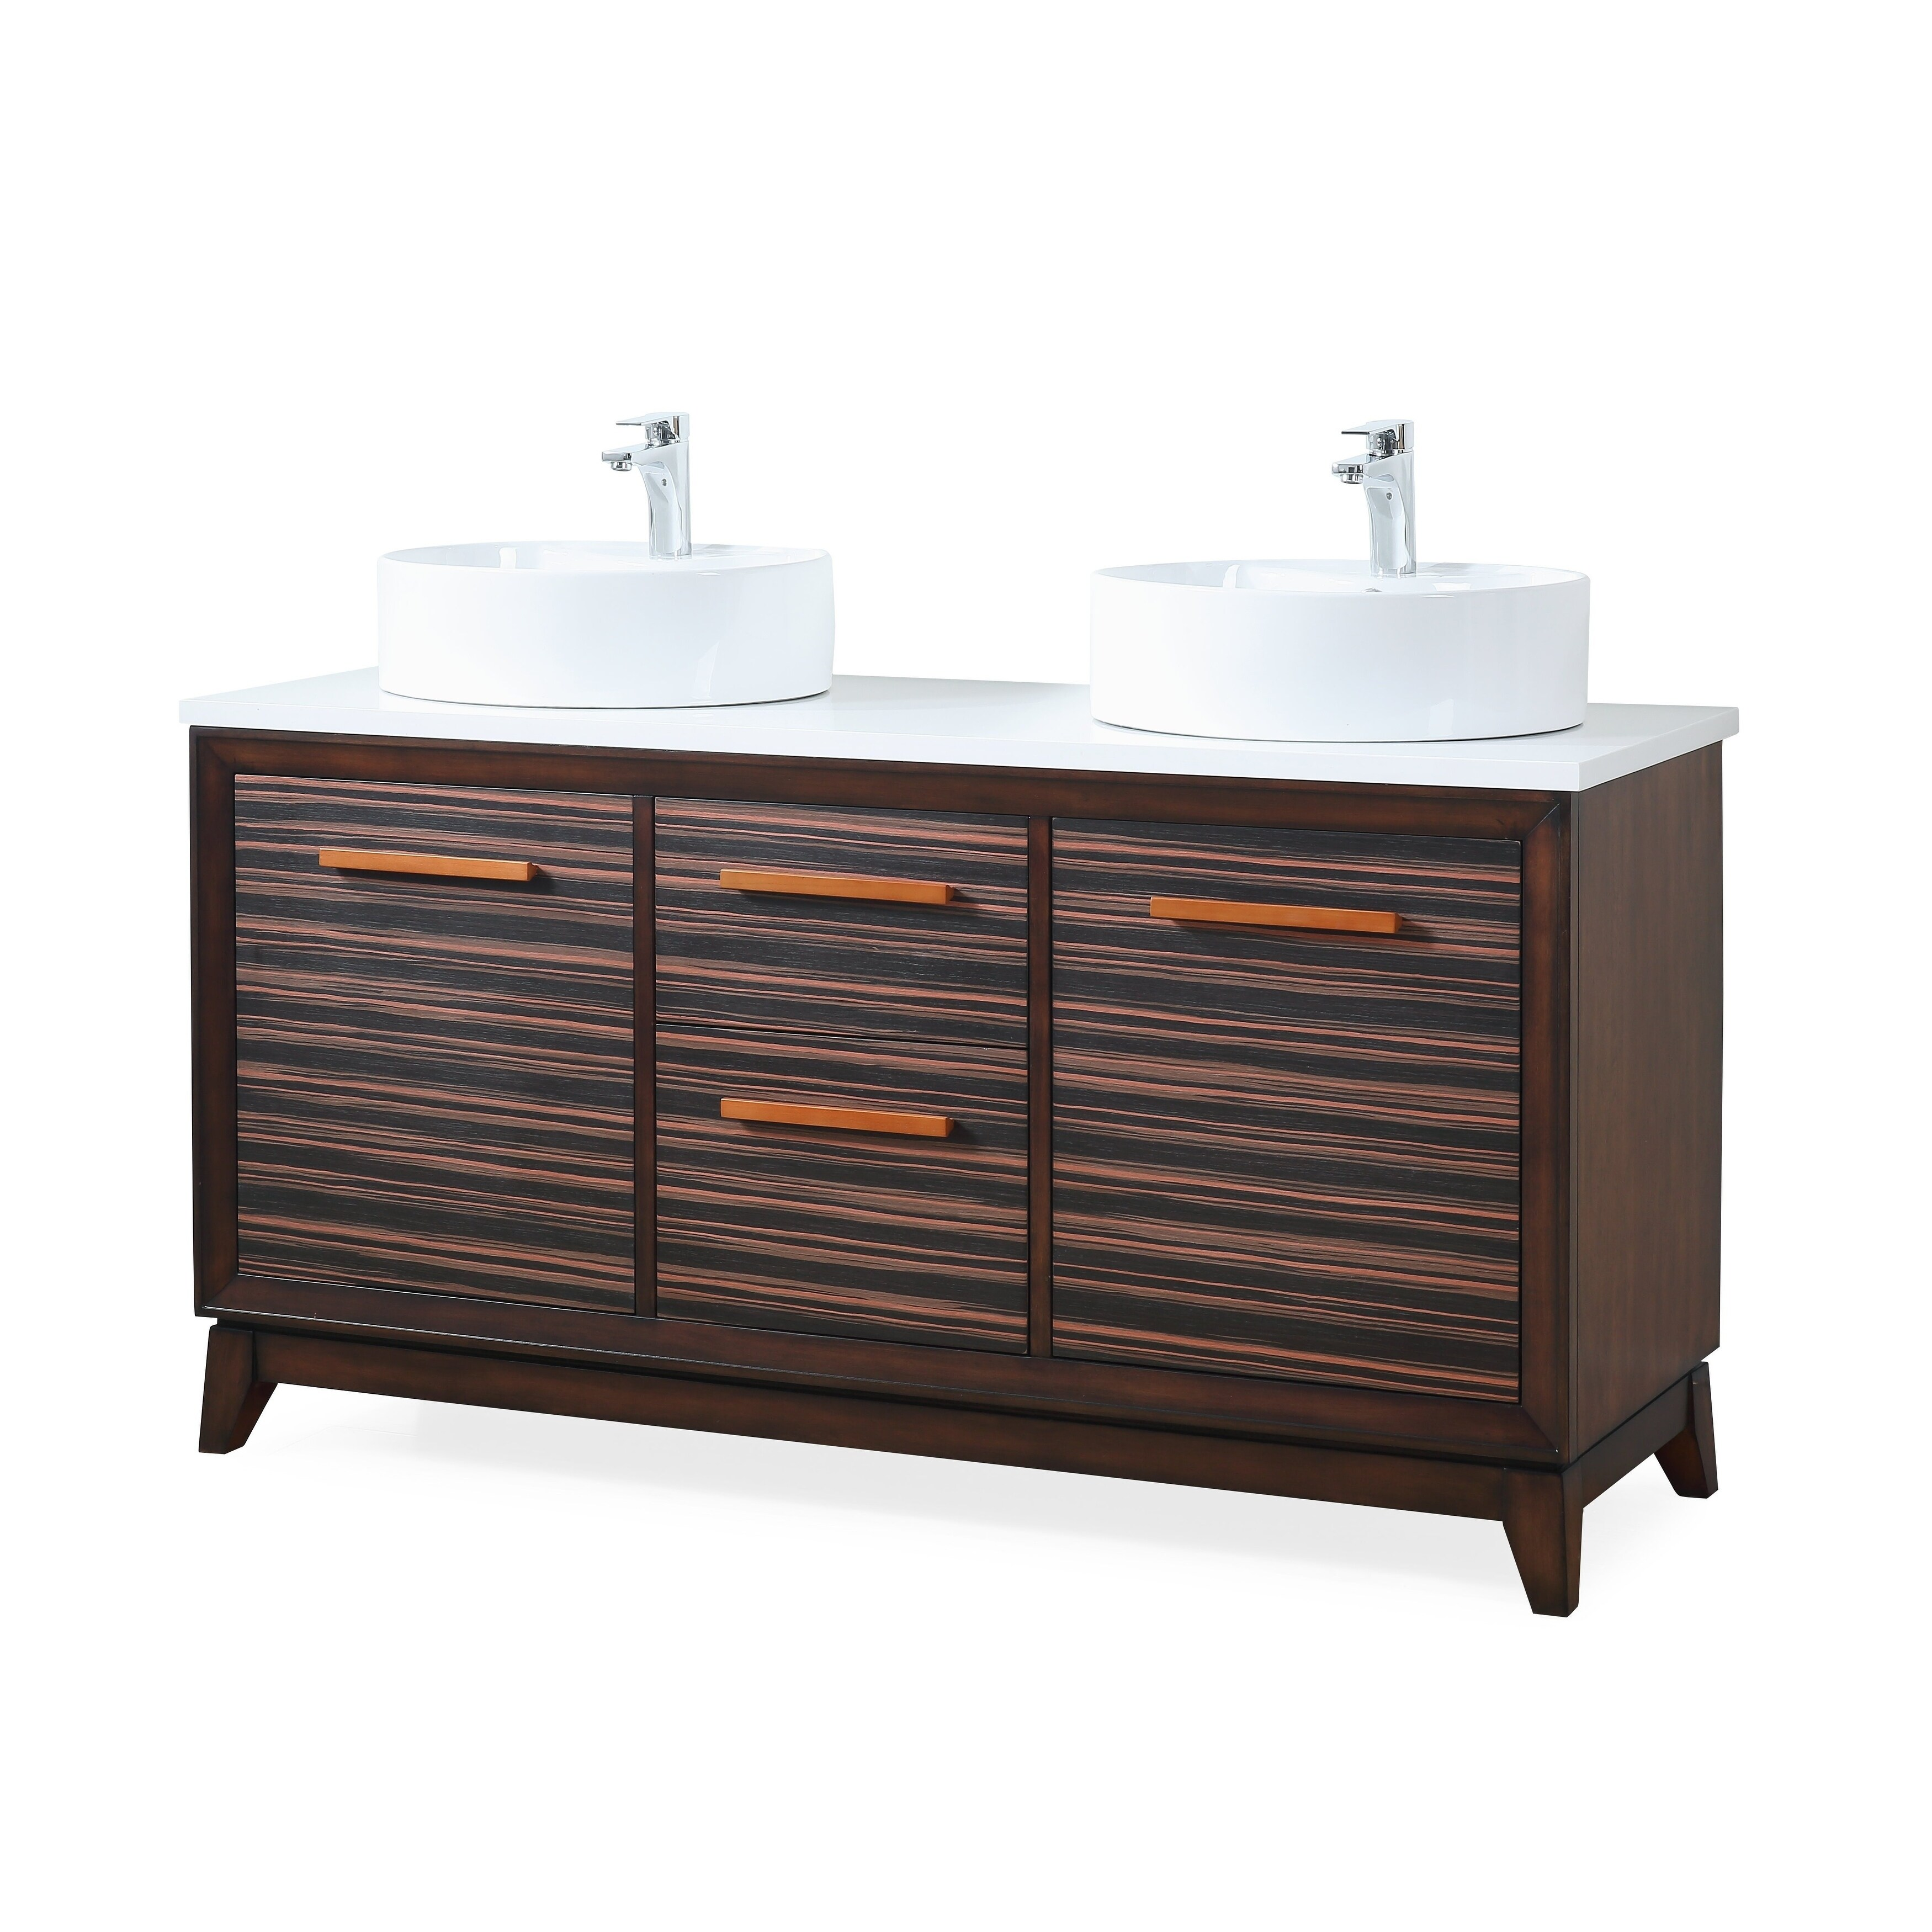 "Shop 63"" Tennnat Brand Arturo Double Sink Art Deco Bathroom Vanity"